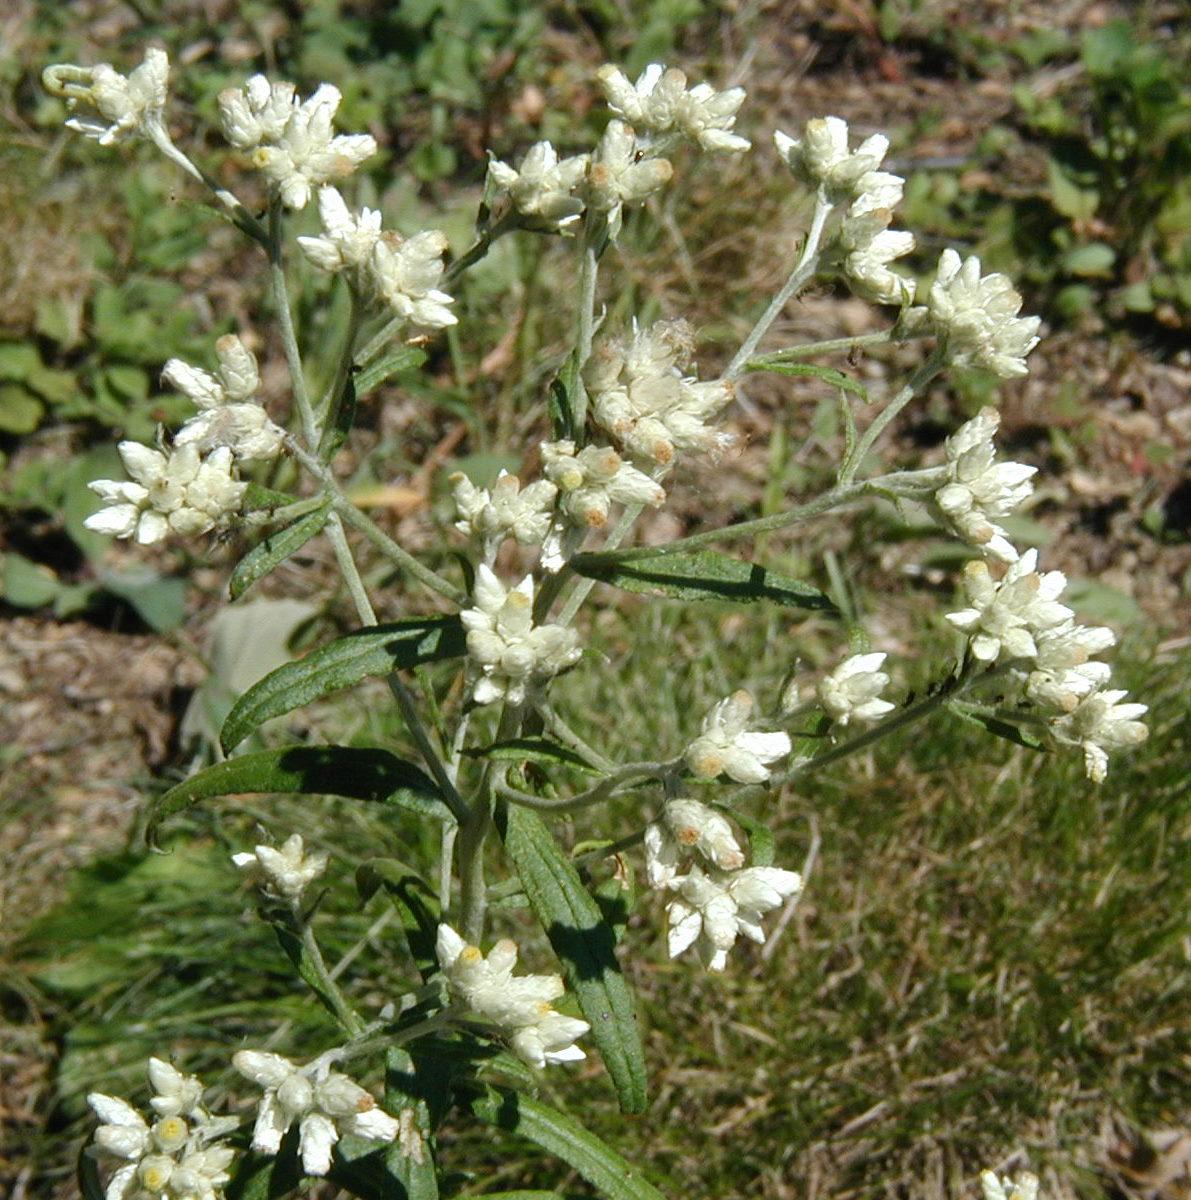 Sweet everlasting blooms for weeks white cottony flower heads of sweet everlasting izmirmasajfo